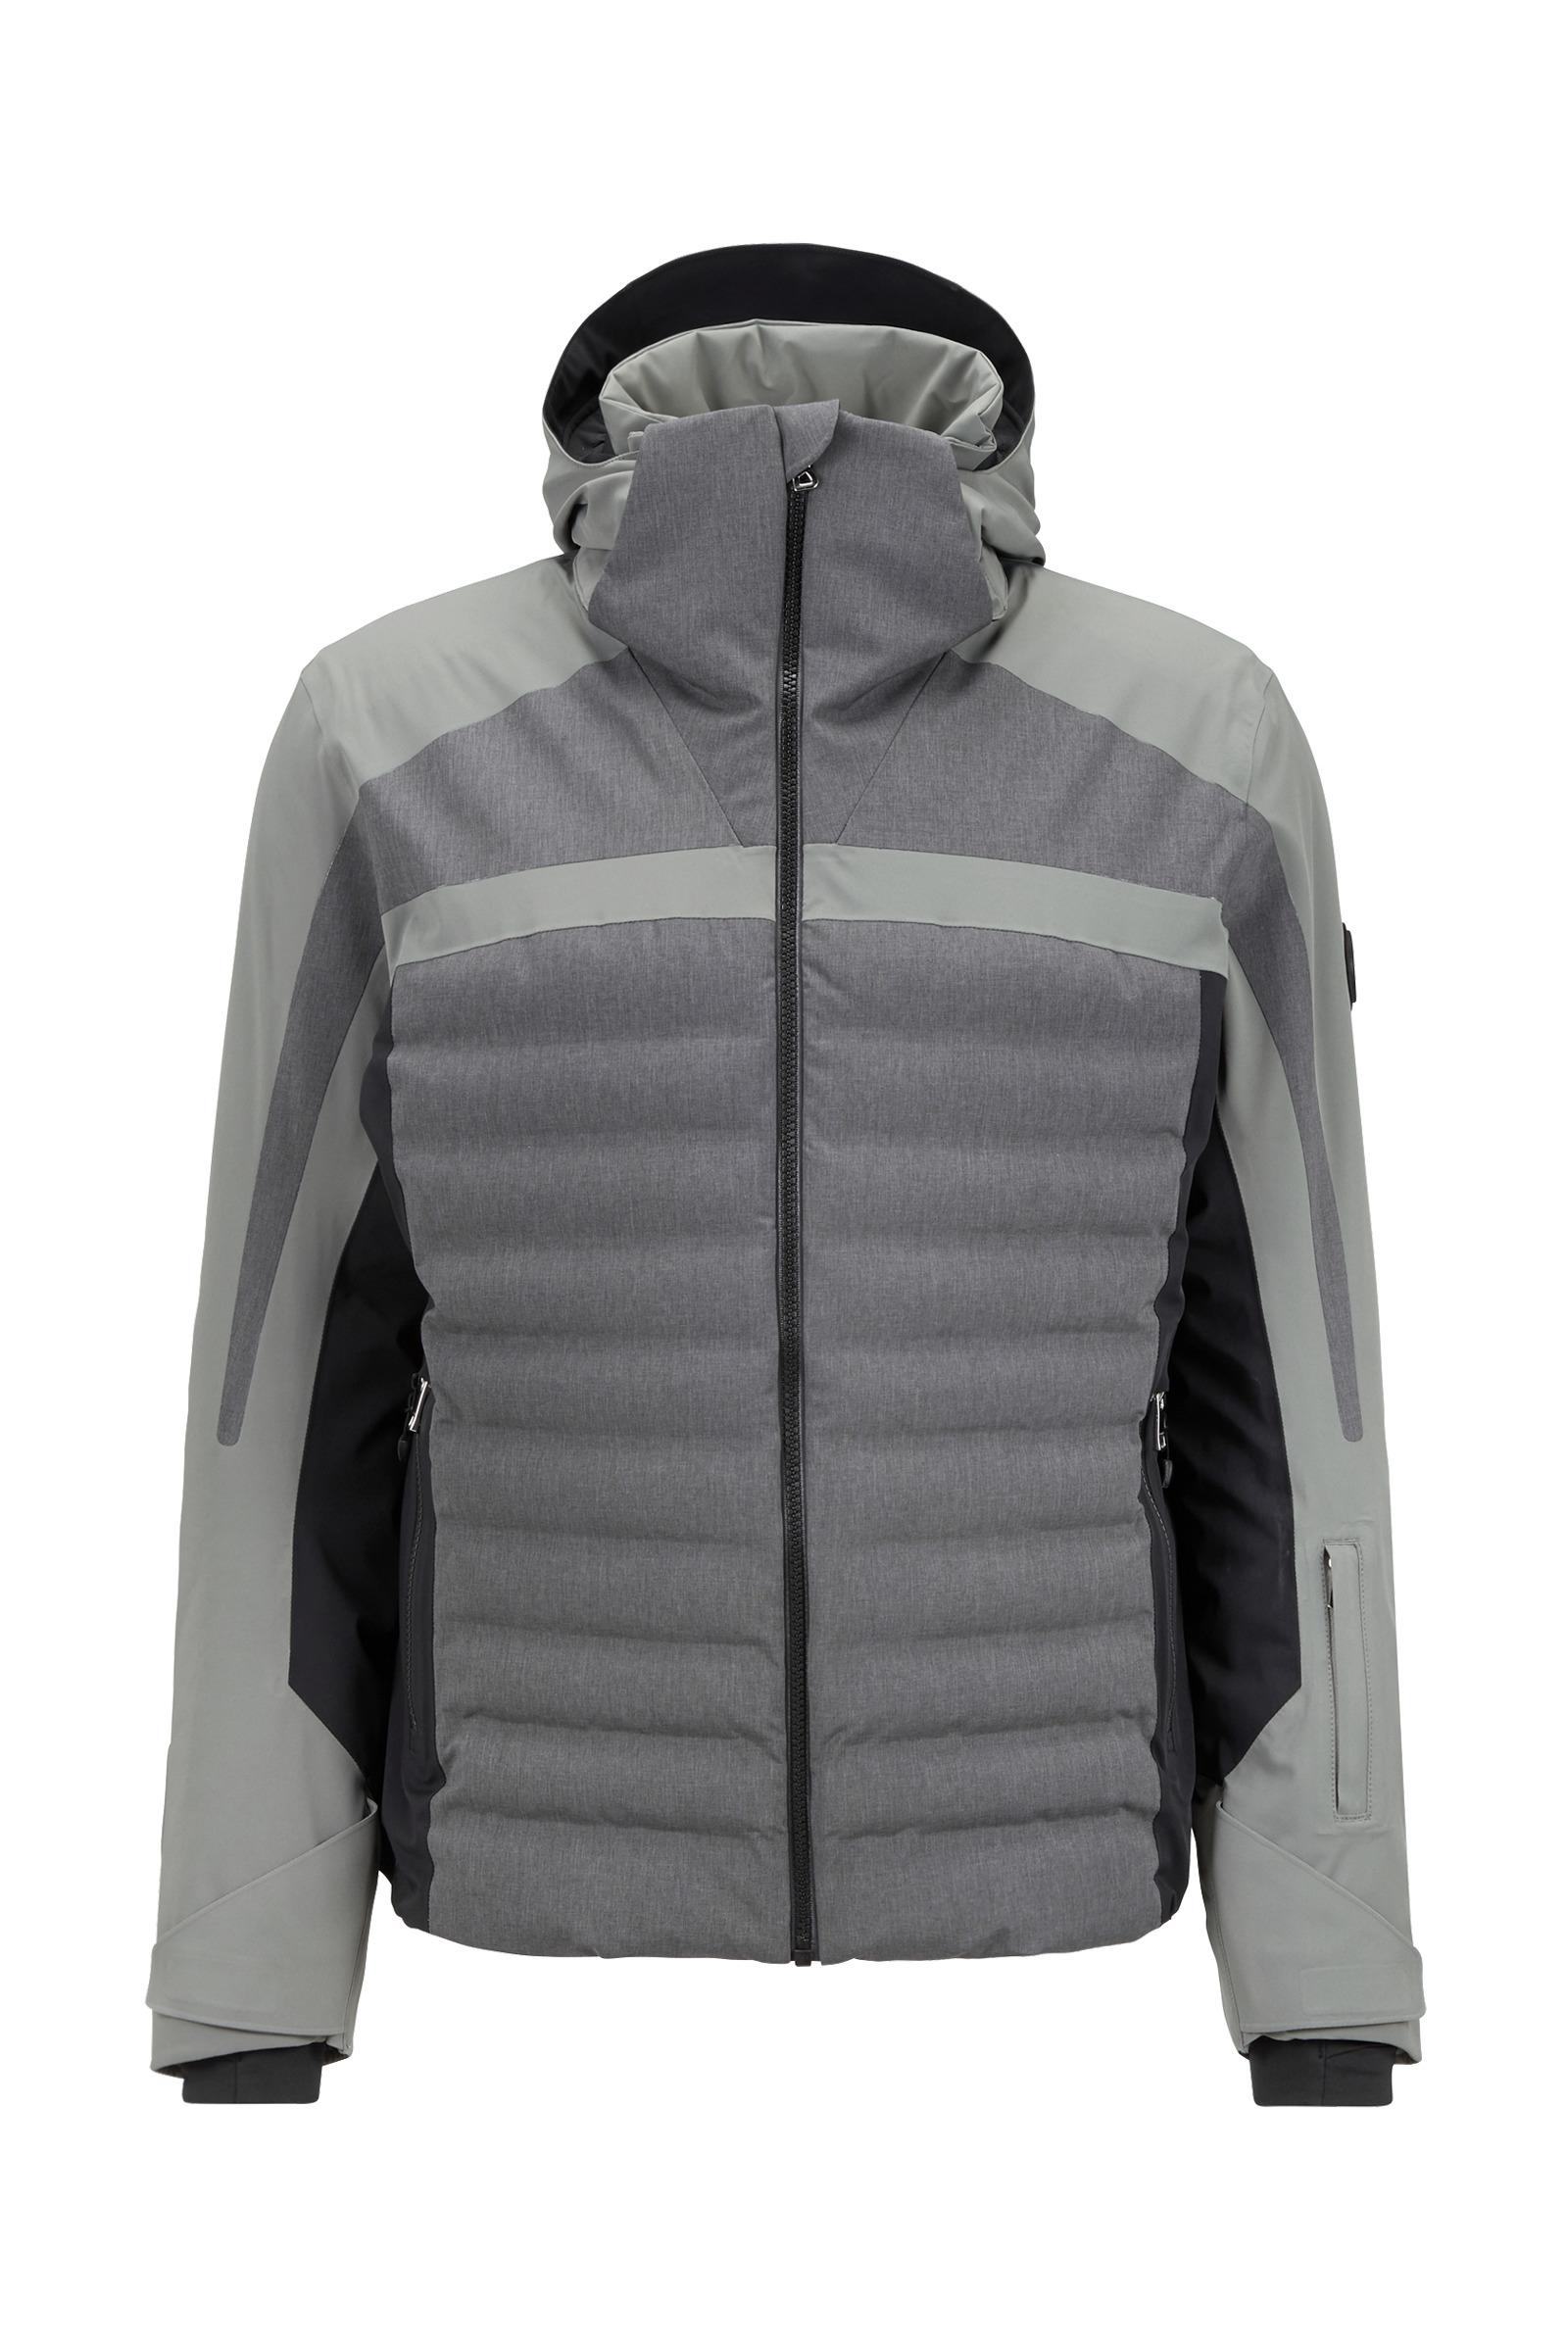 low priced a29c5 17c47 Bogner Lech-T 18/19 - Herren Skijacke Snowboard Jacke - 3122 4815-120  grau/olive